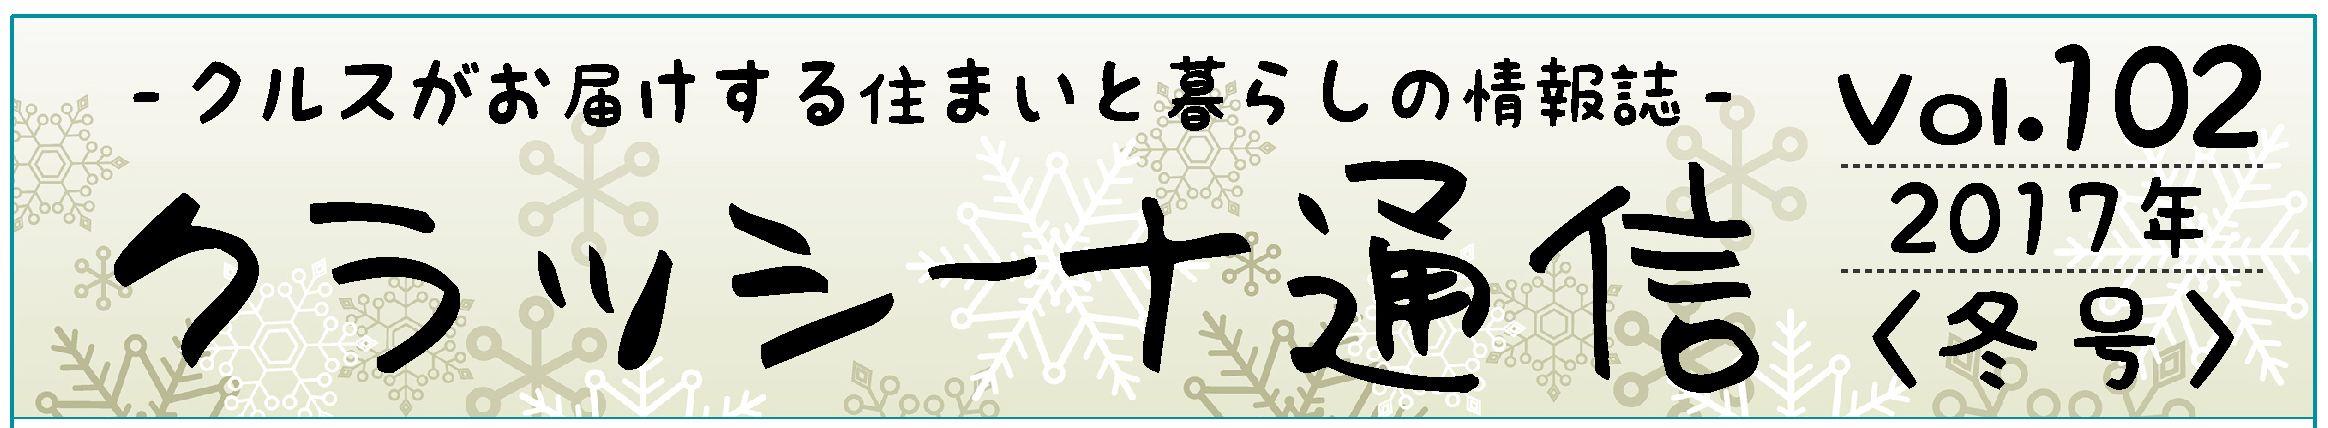 KuraSi-natu-sin102-01.jpg